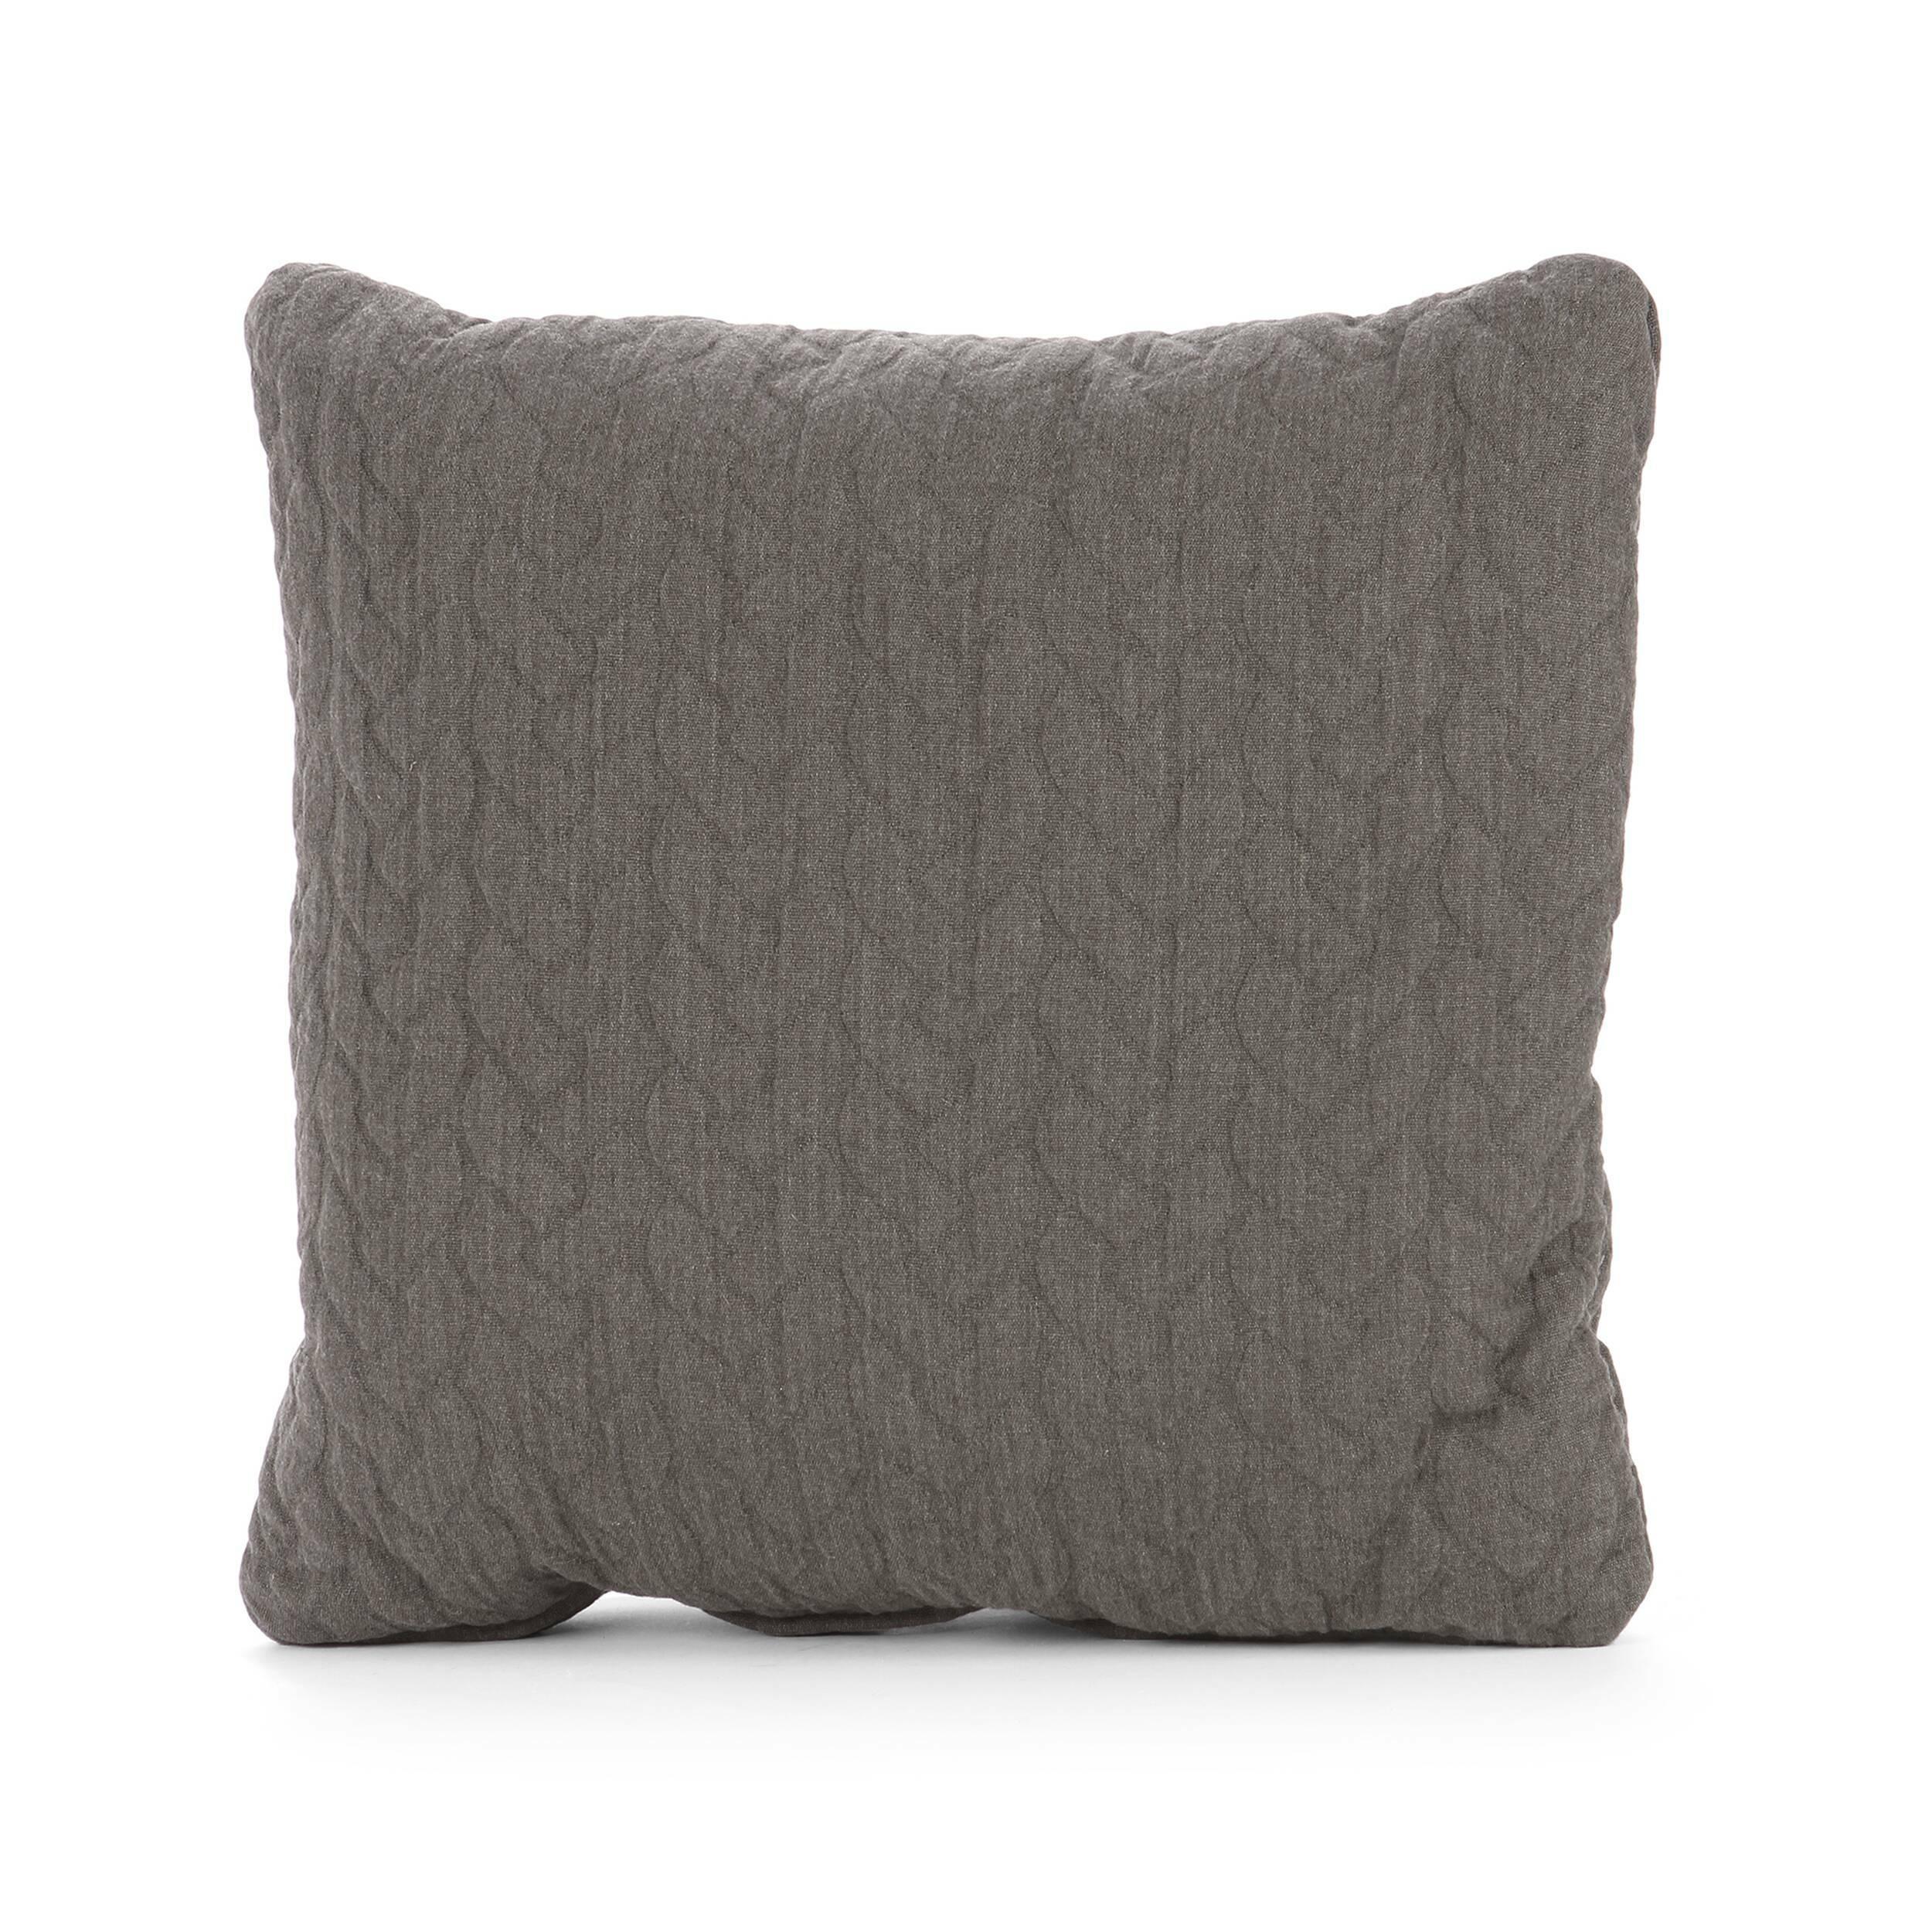 Декоративная подушка Sits 14771961 от Cosmorelax